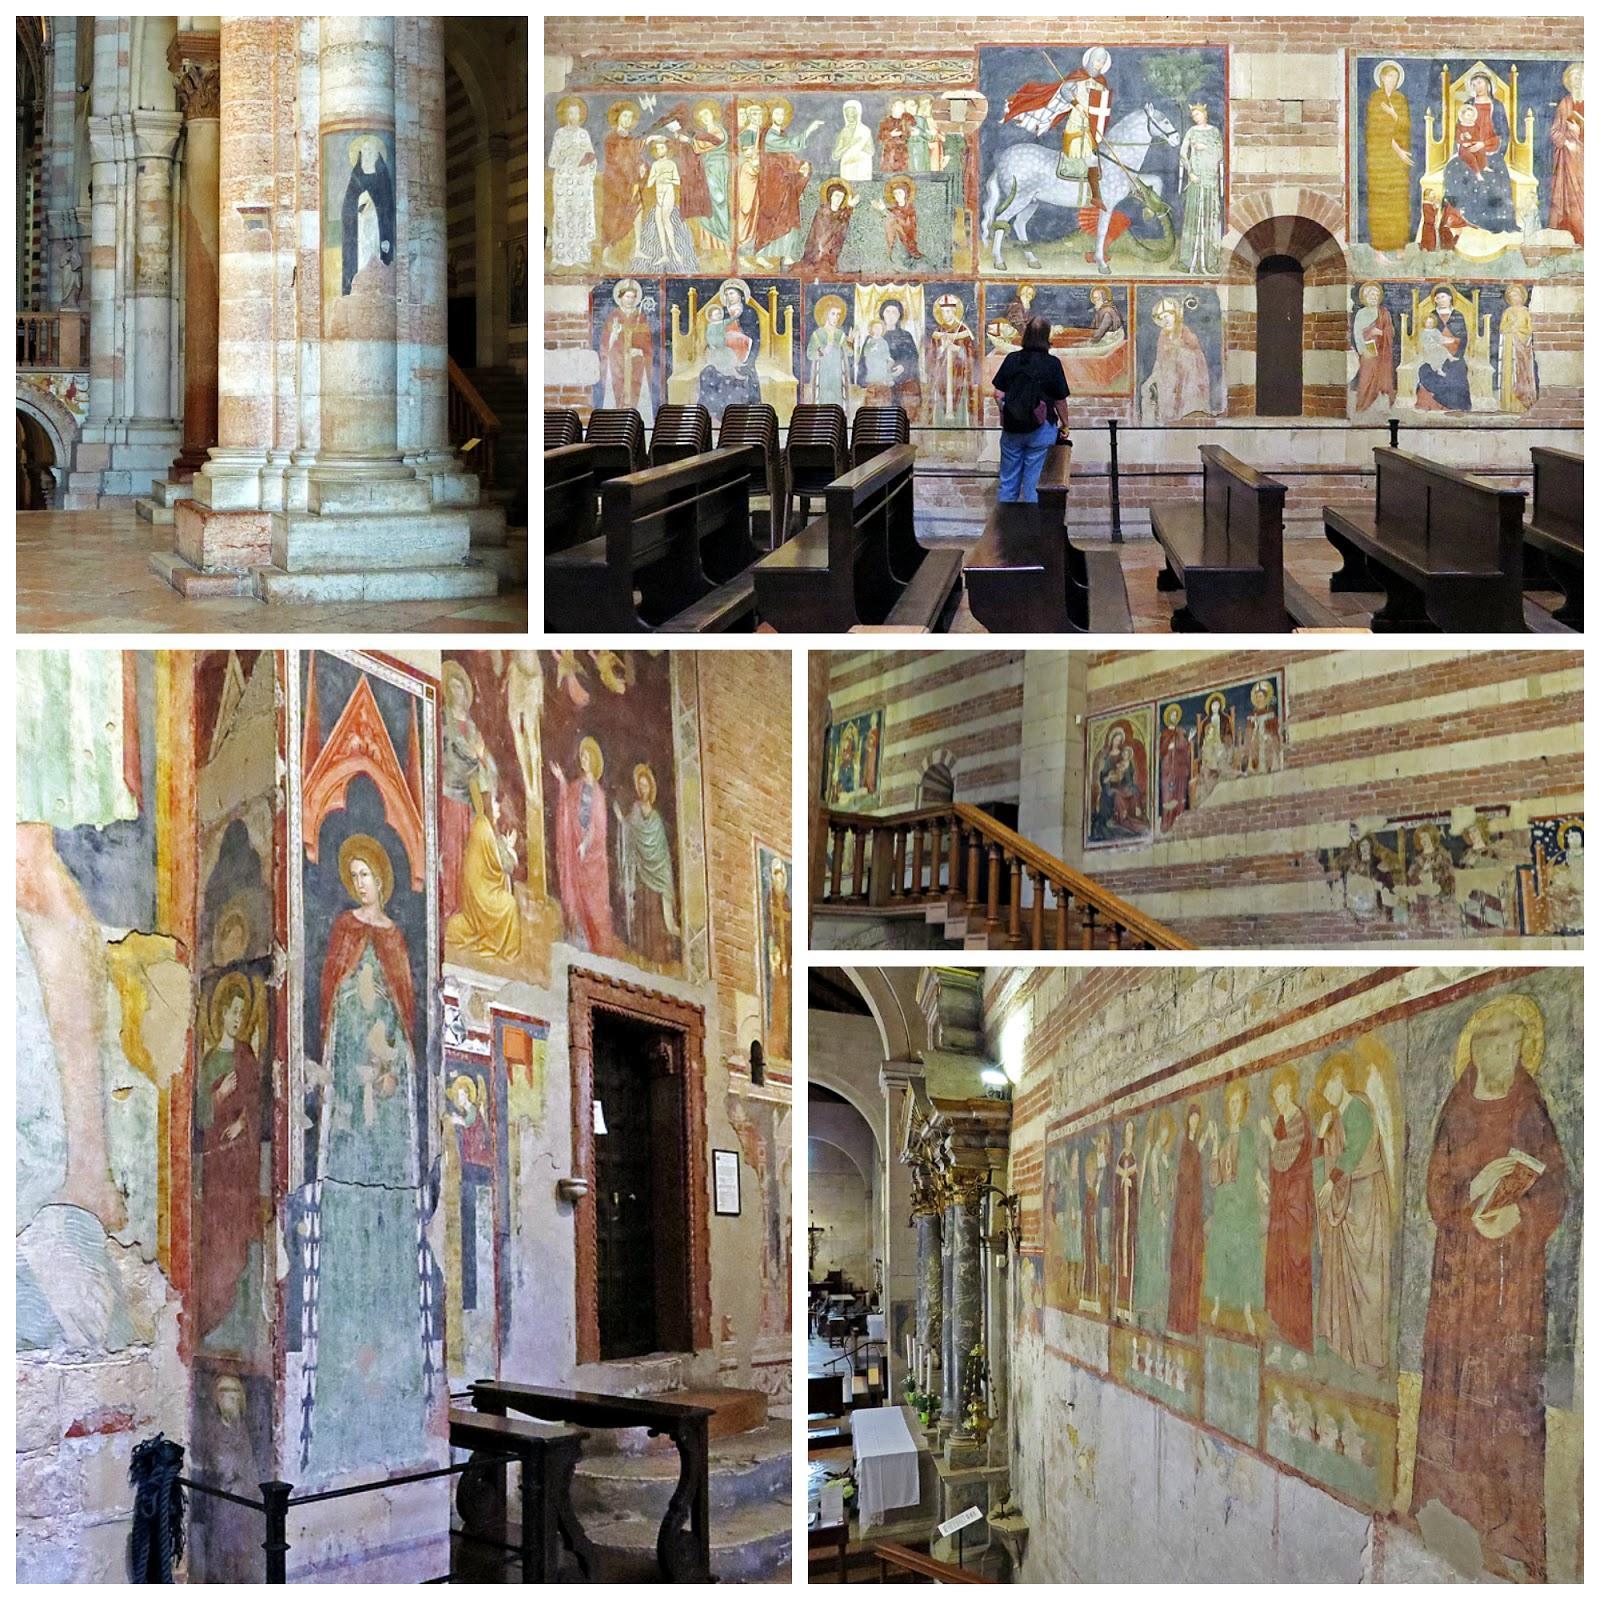 In Soul: VERONA 2017: The Three Basilicas